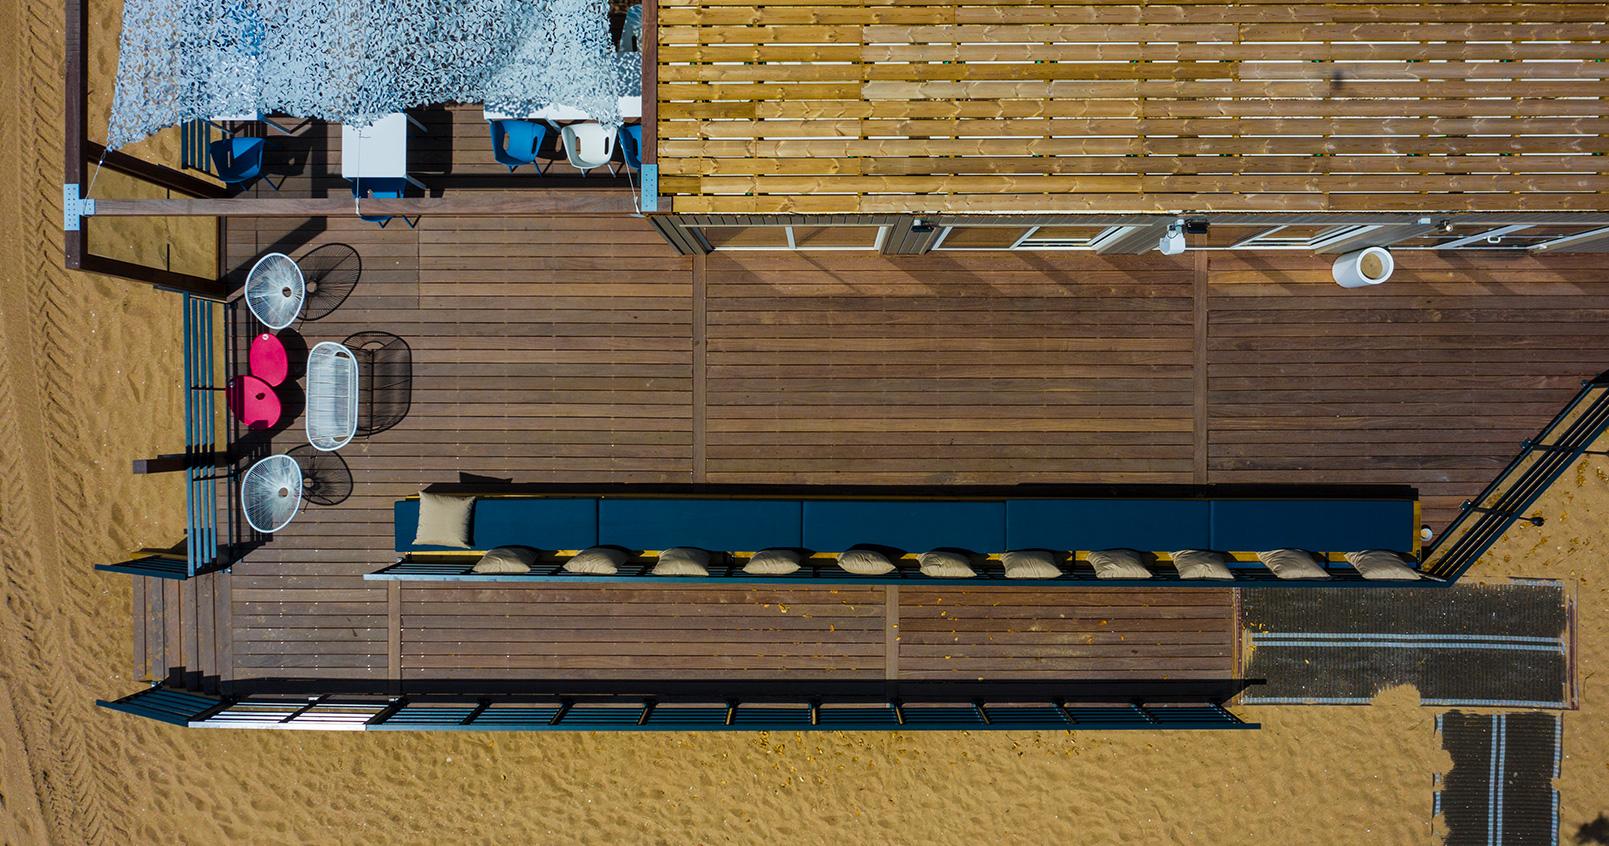 Vue aérienne du restaurant de plage La Barbade